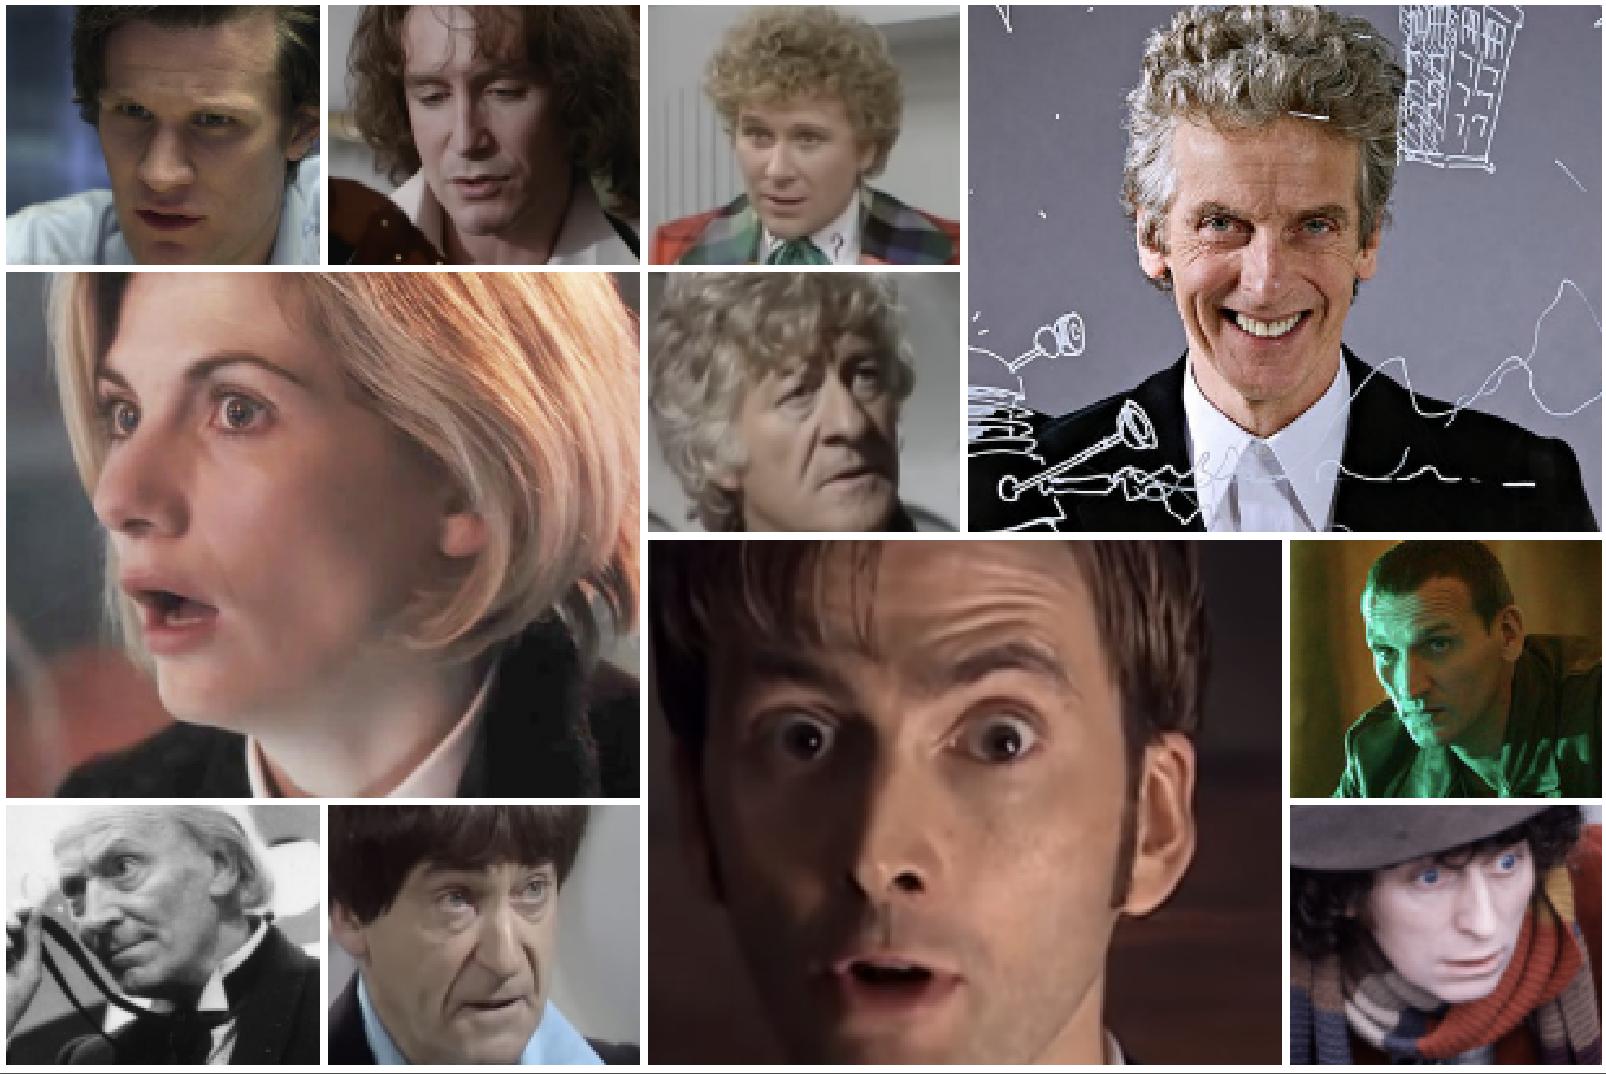 Youtube screengrabs, BBC, TL